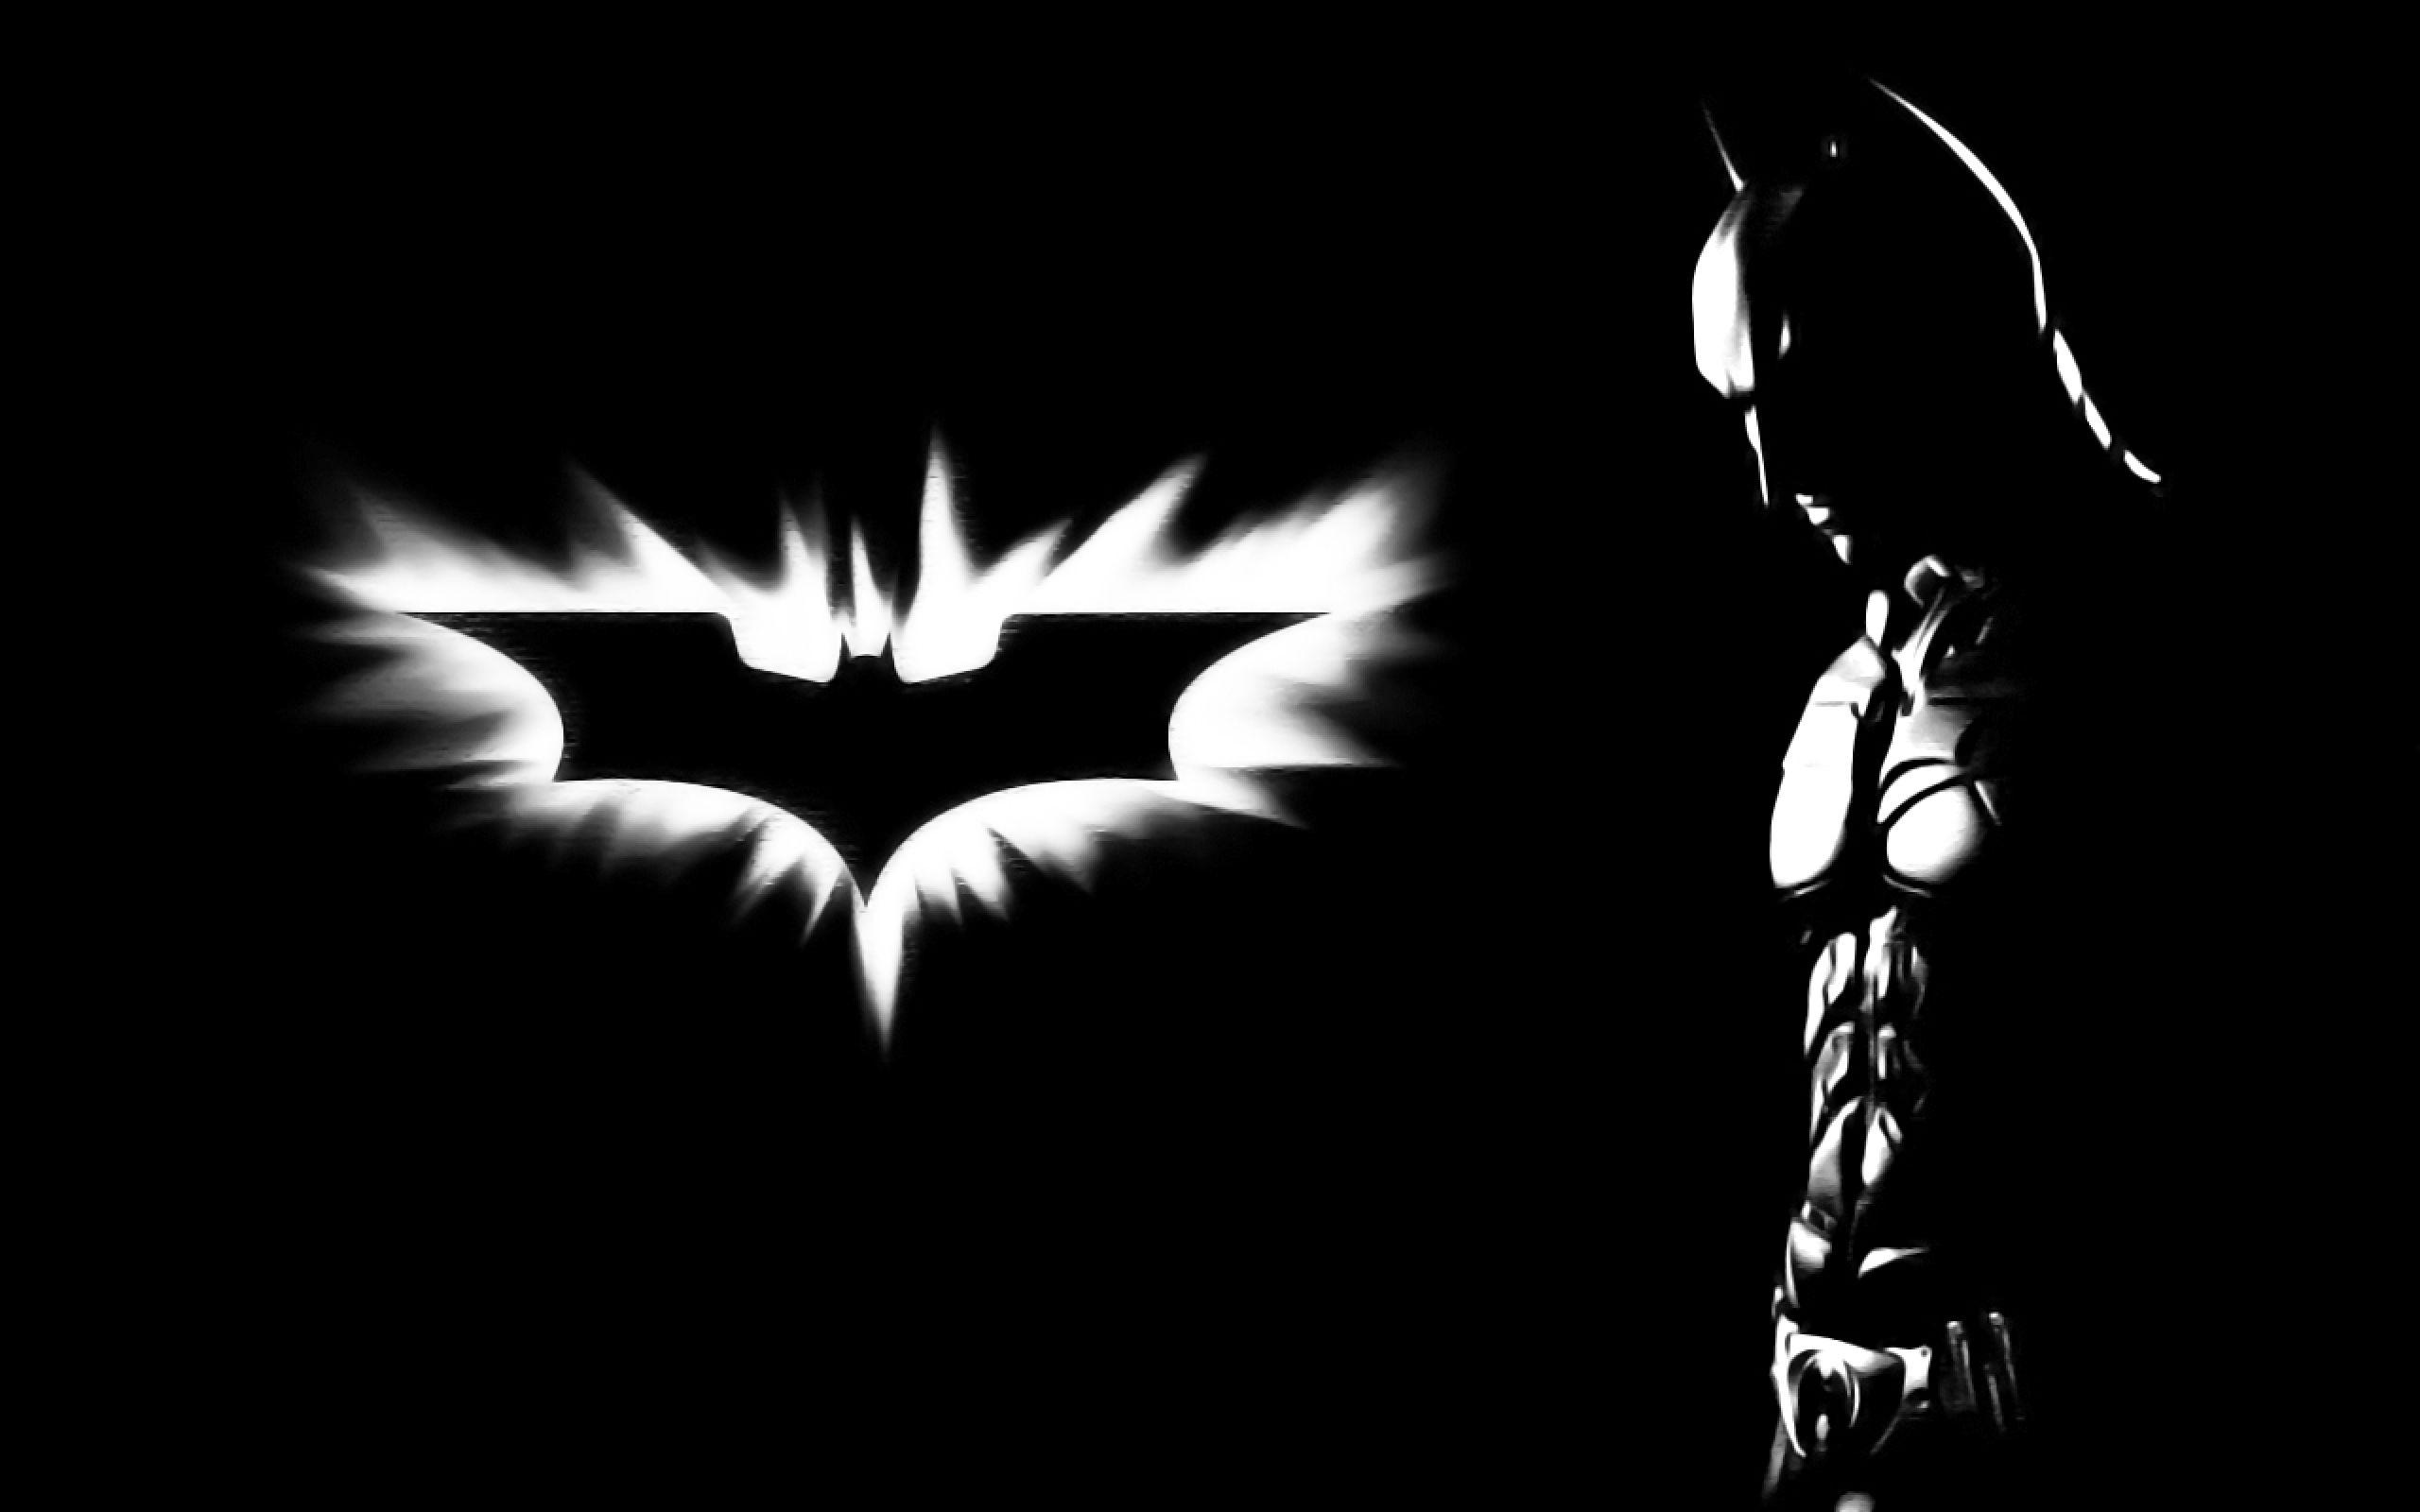 batman desktop wallpaper pk high resolution batman pictures